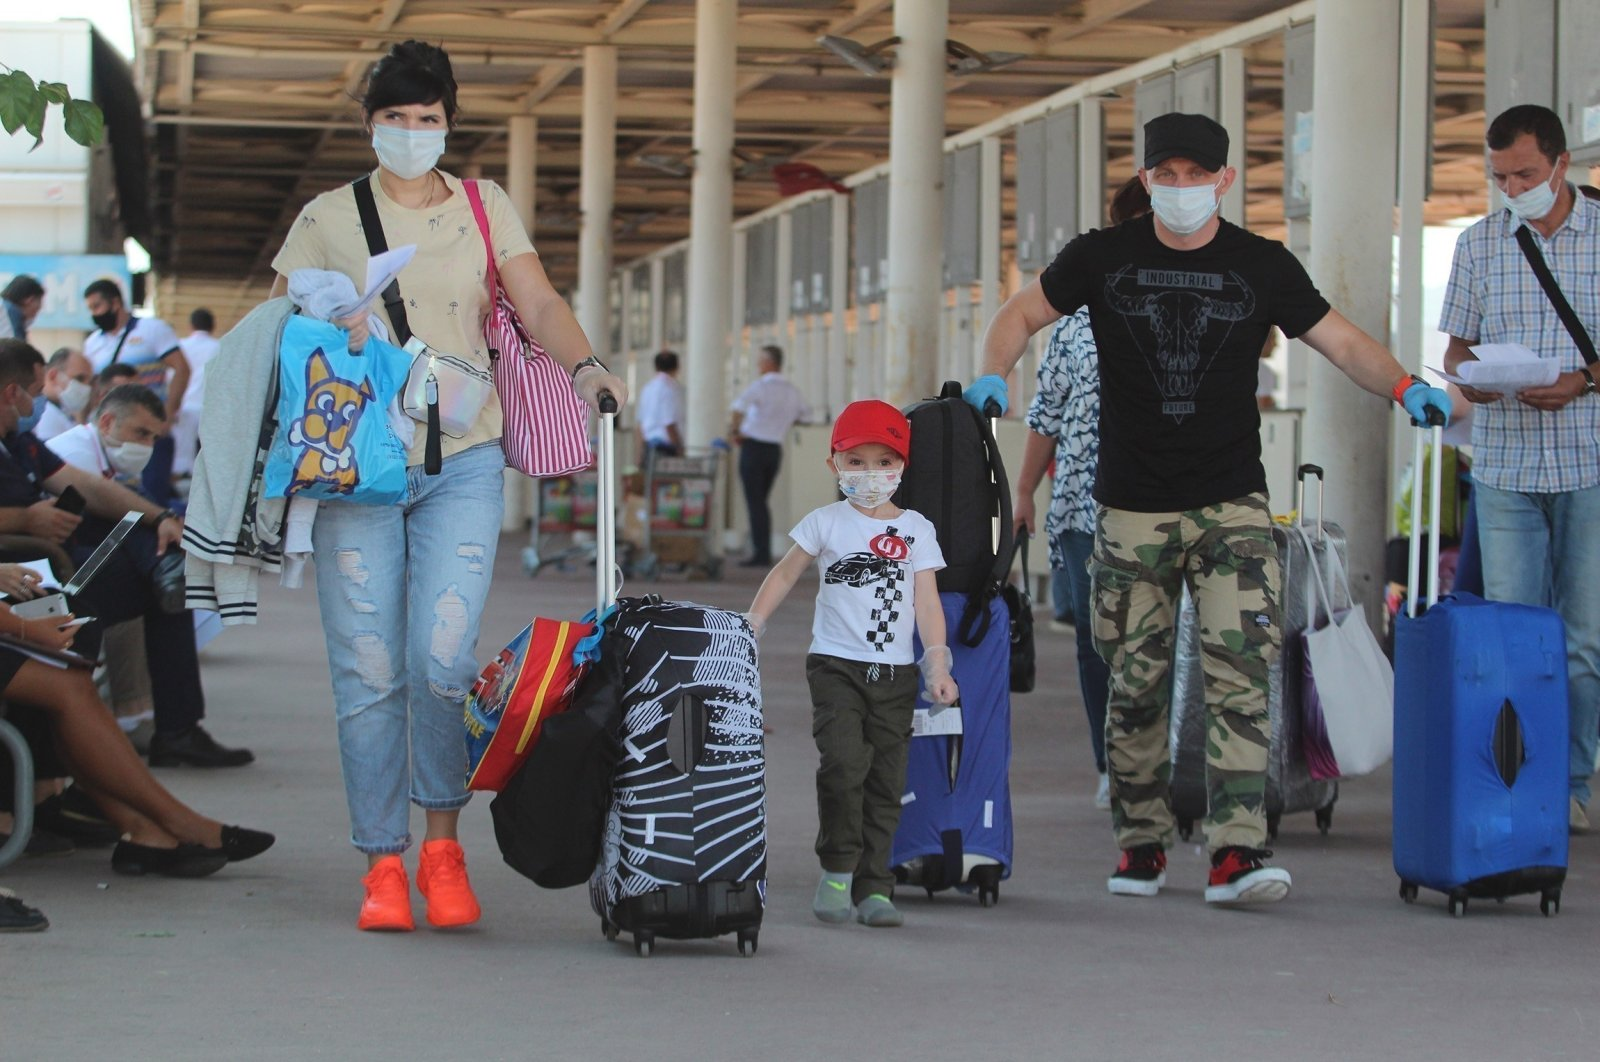 Tourists arrive at Antalya Airport, Antalya, southern Turkey, April 19, 2021. (IHA Photo)